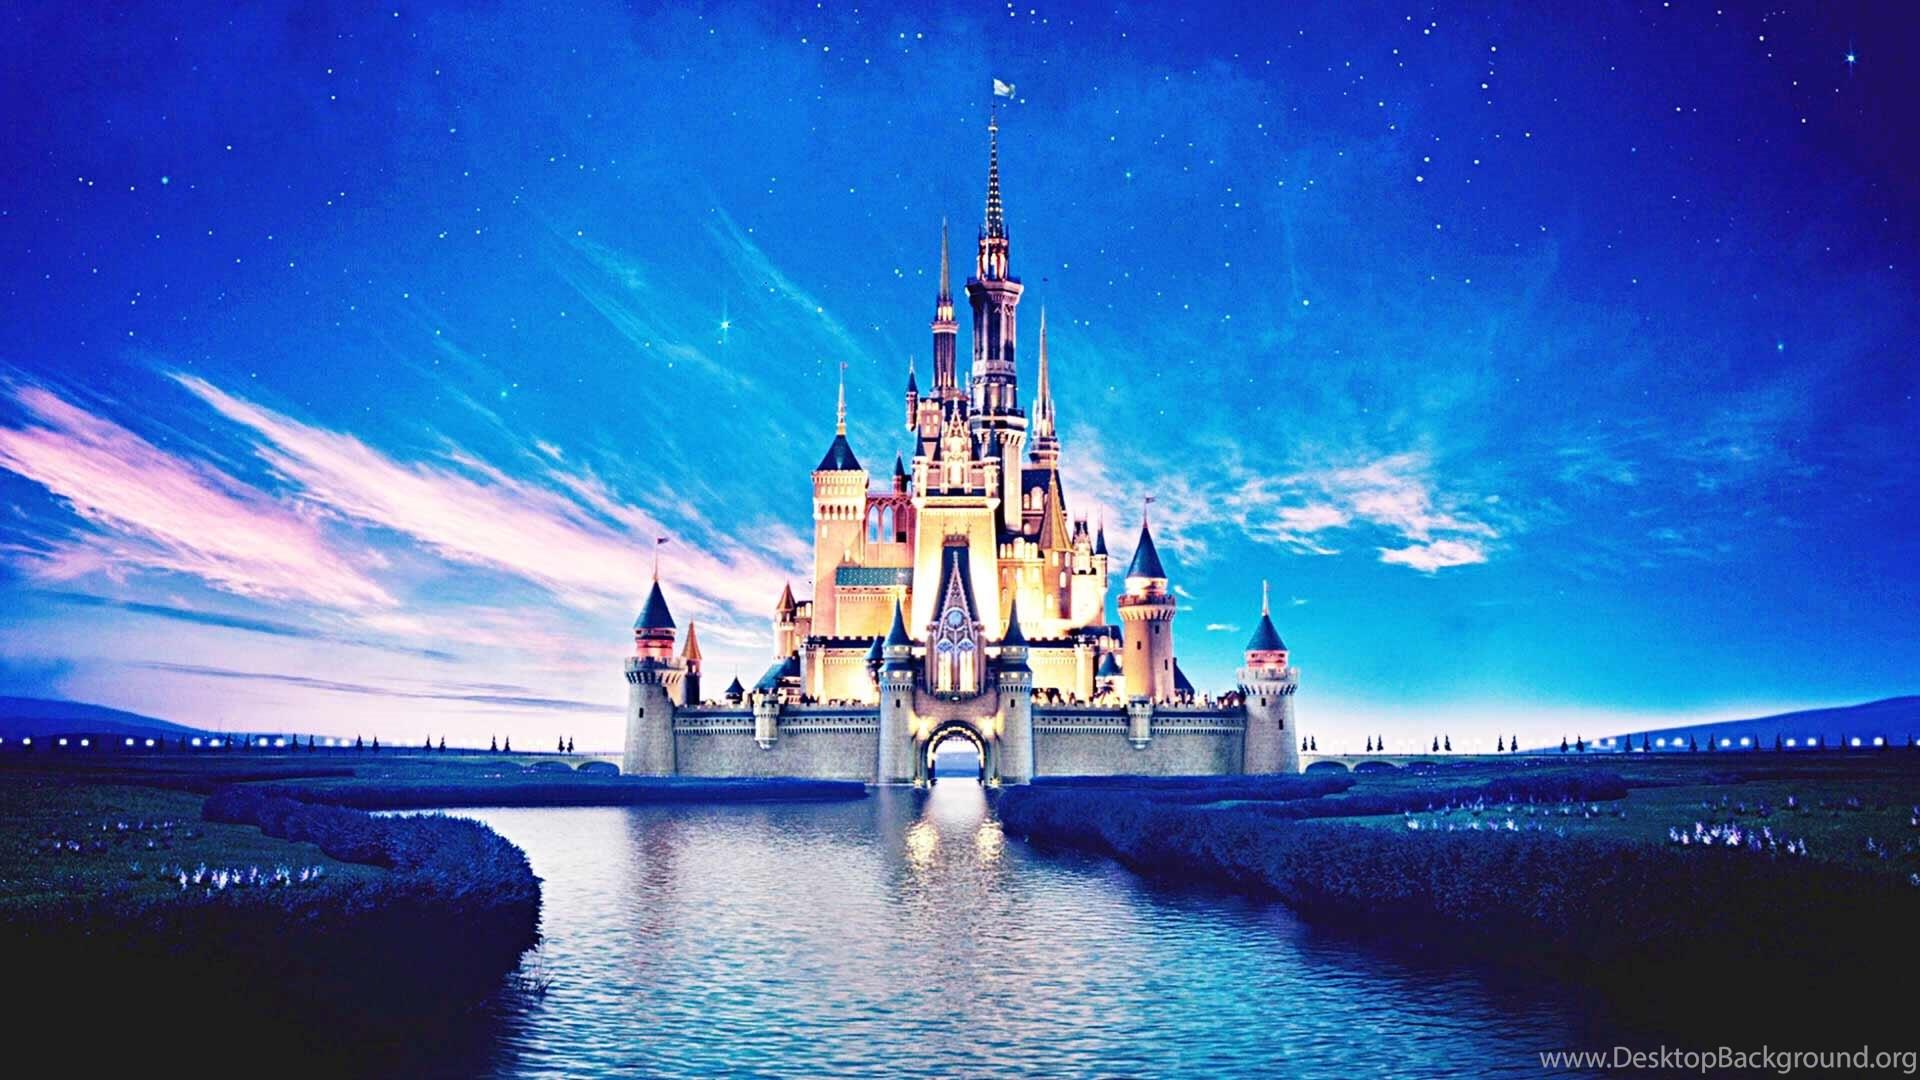 Disney World Hd Wallpaper Disney World Images New Wallpapers Desktop Background